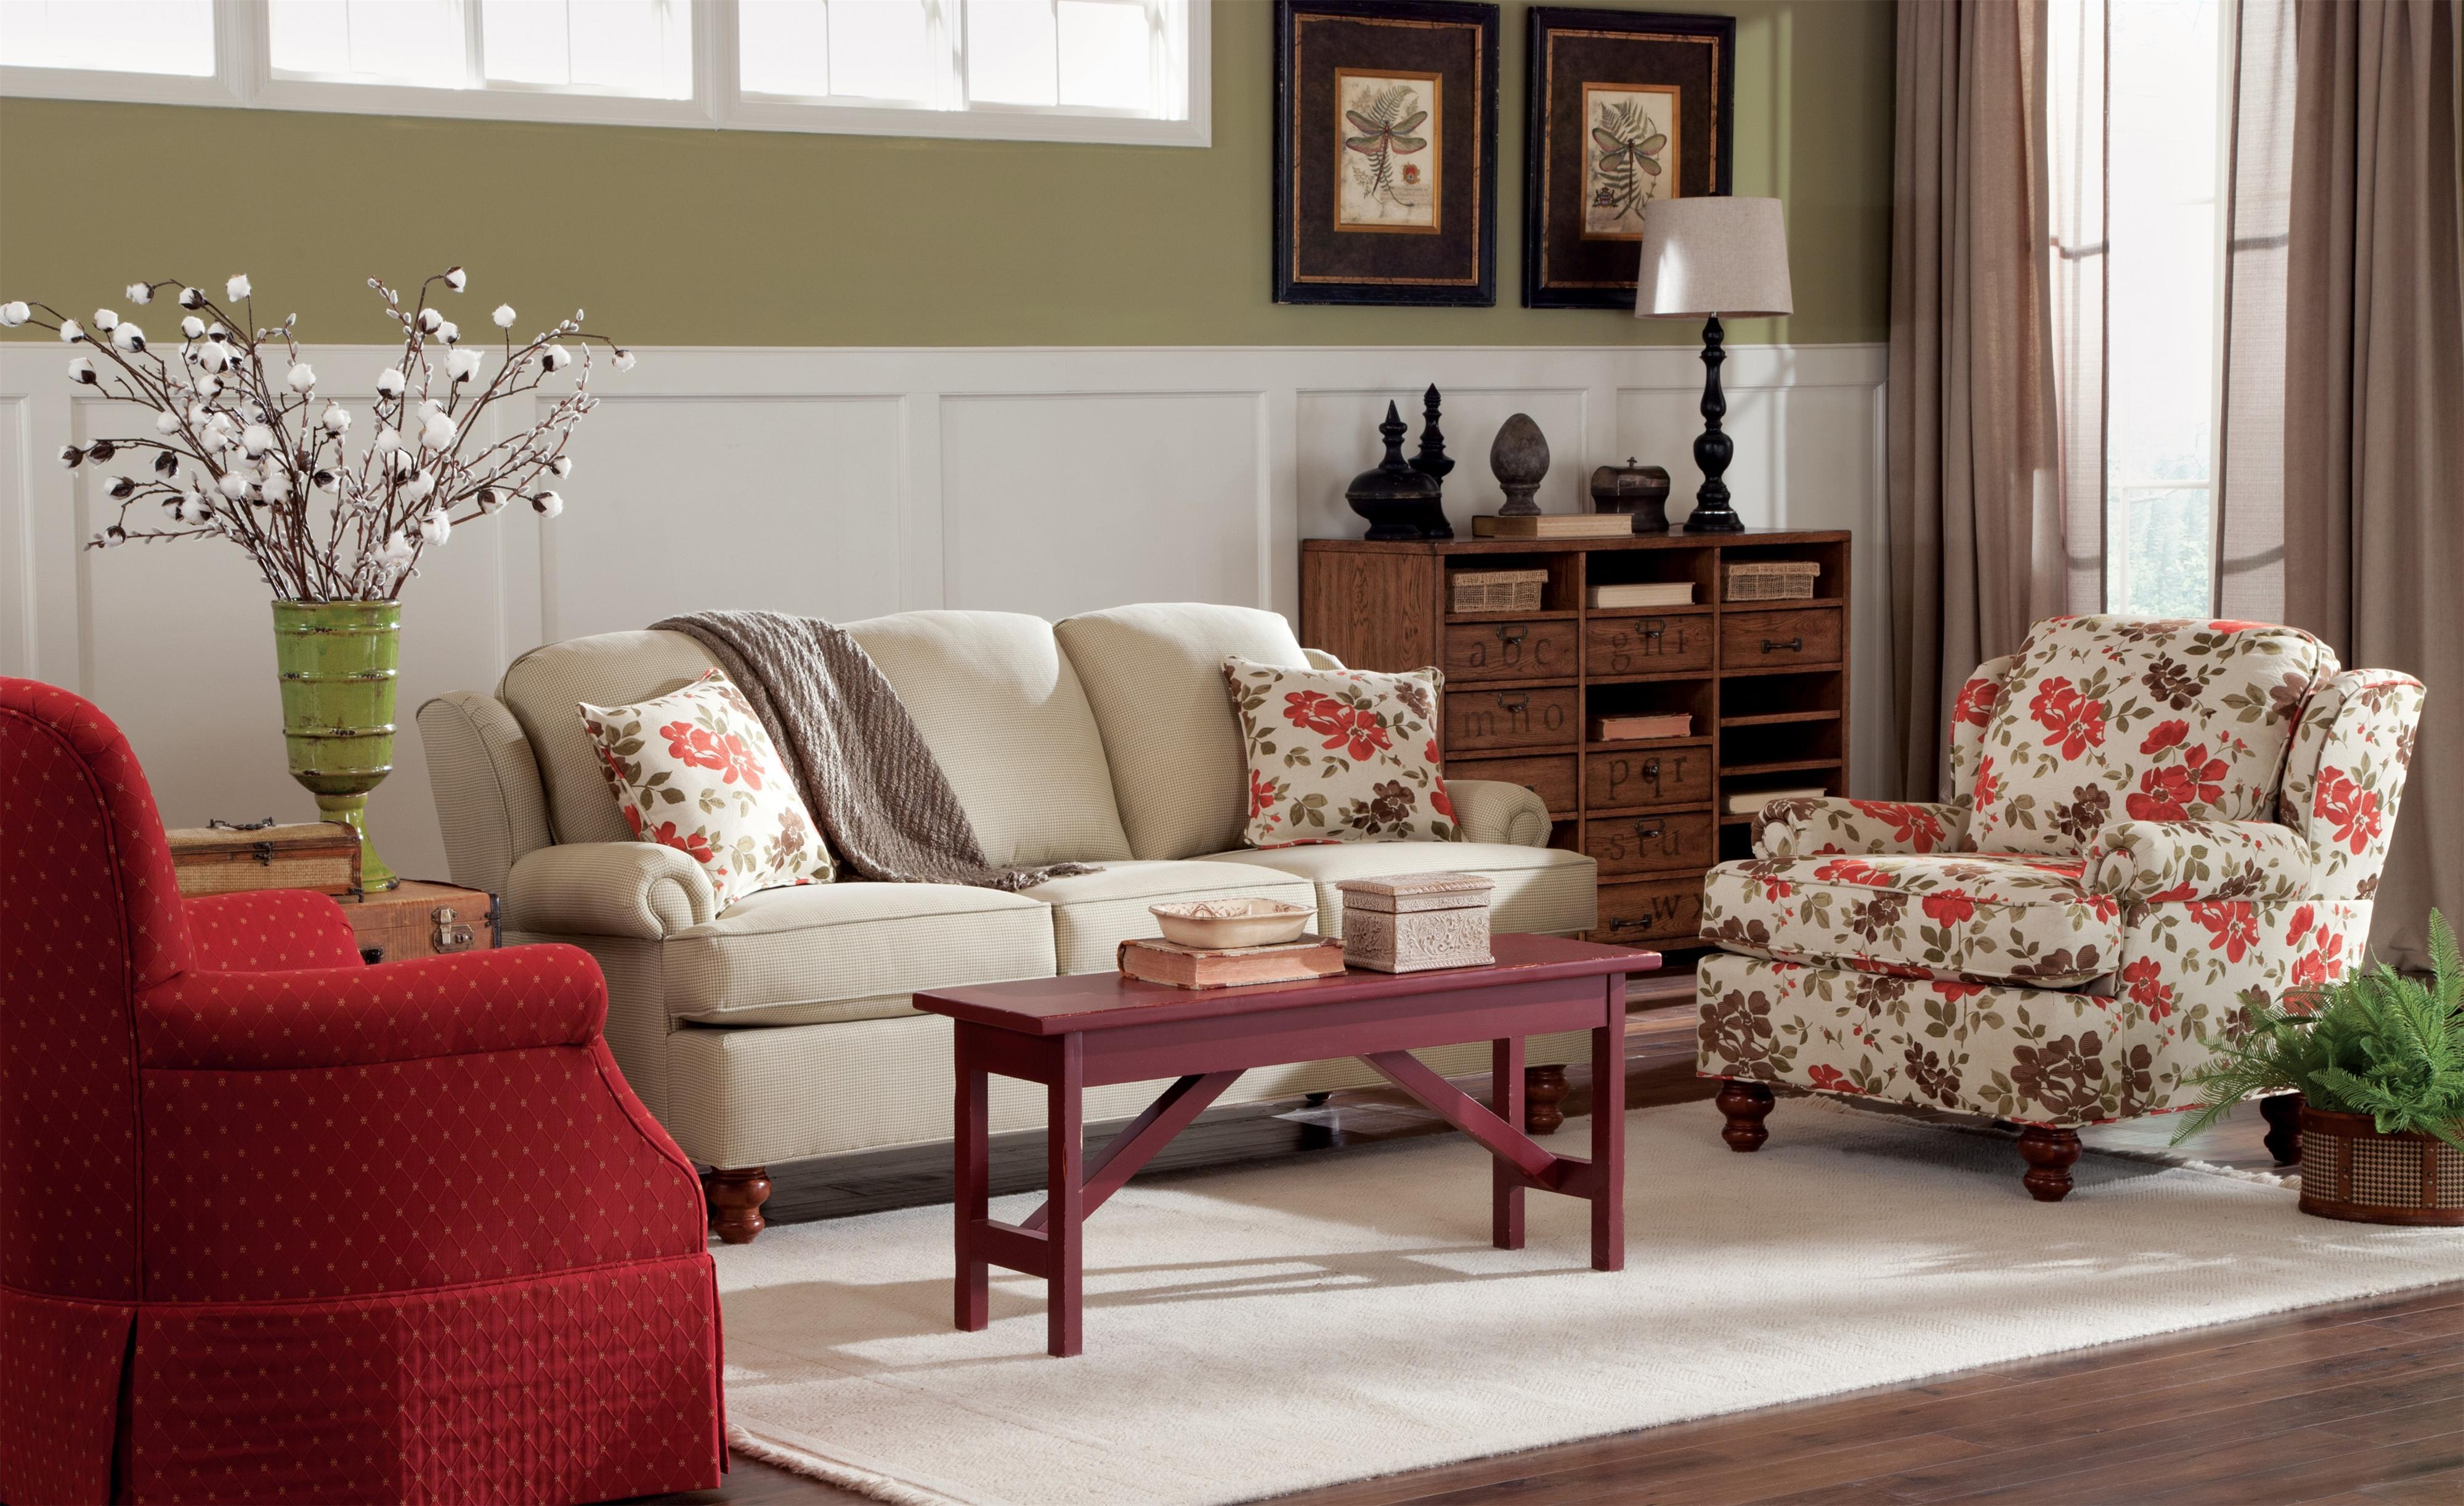 Craftmaster 7402 Stationary Living Room Group Belfort Furniture Upholstery Group: paula deen living room furniture